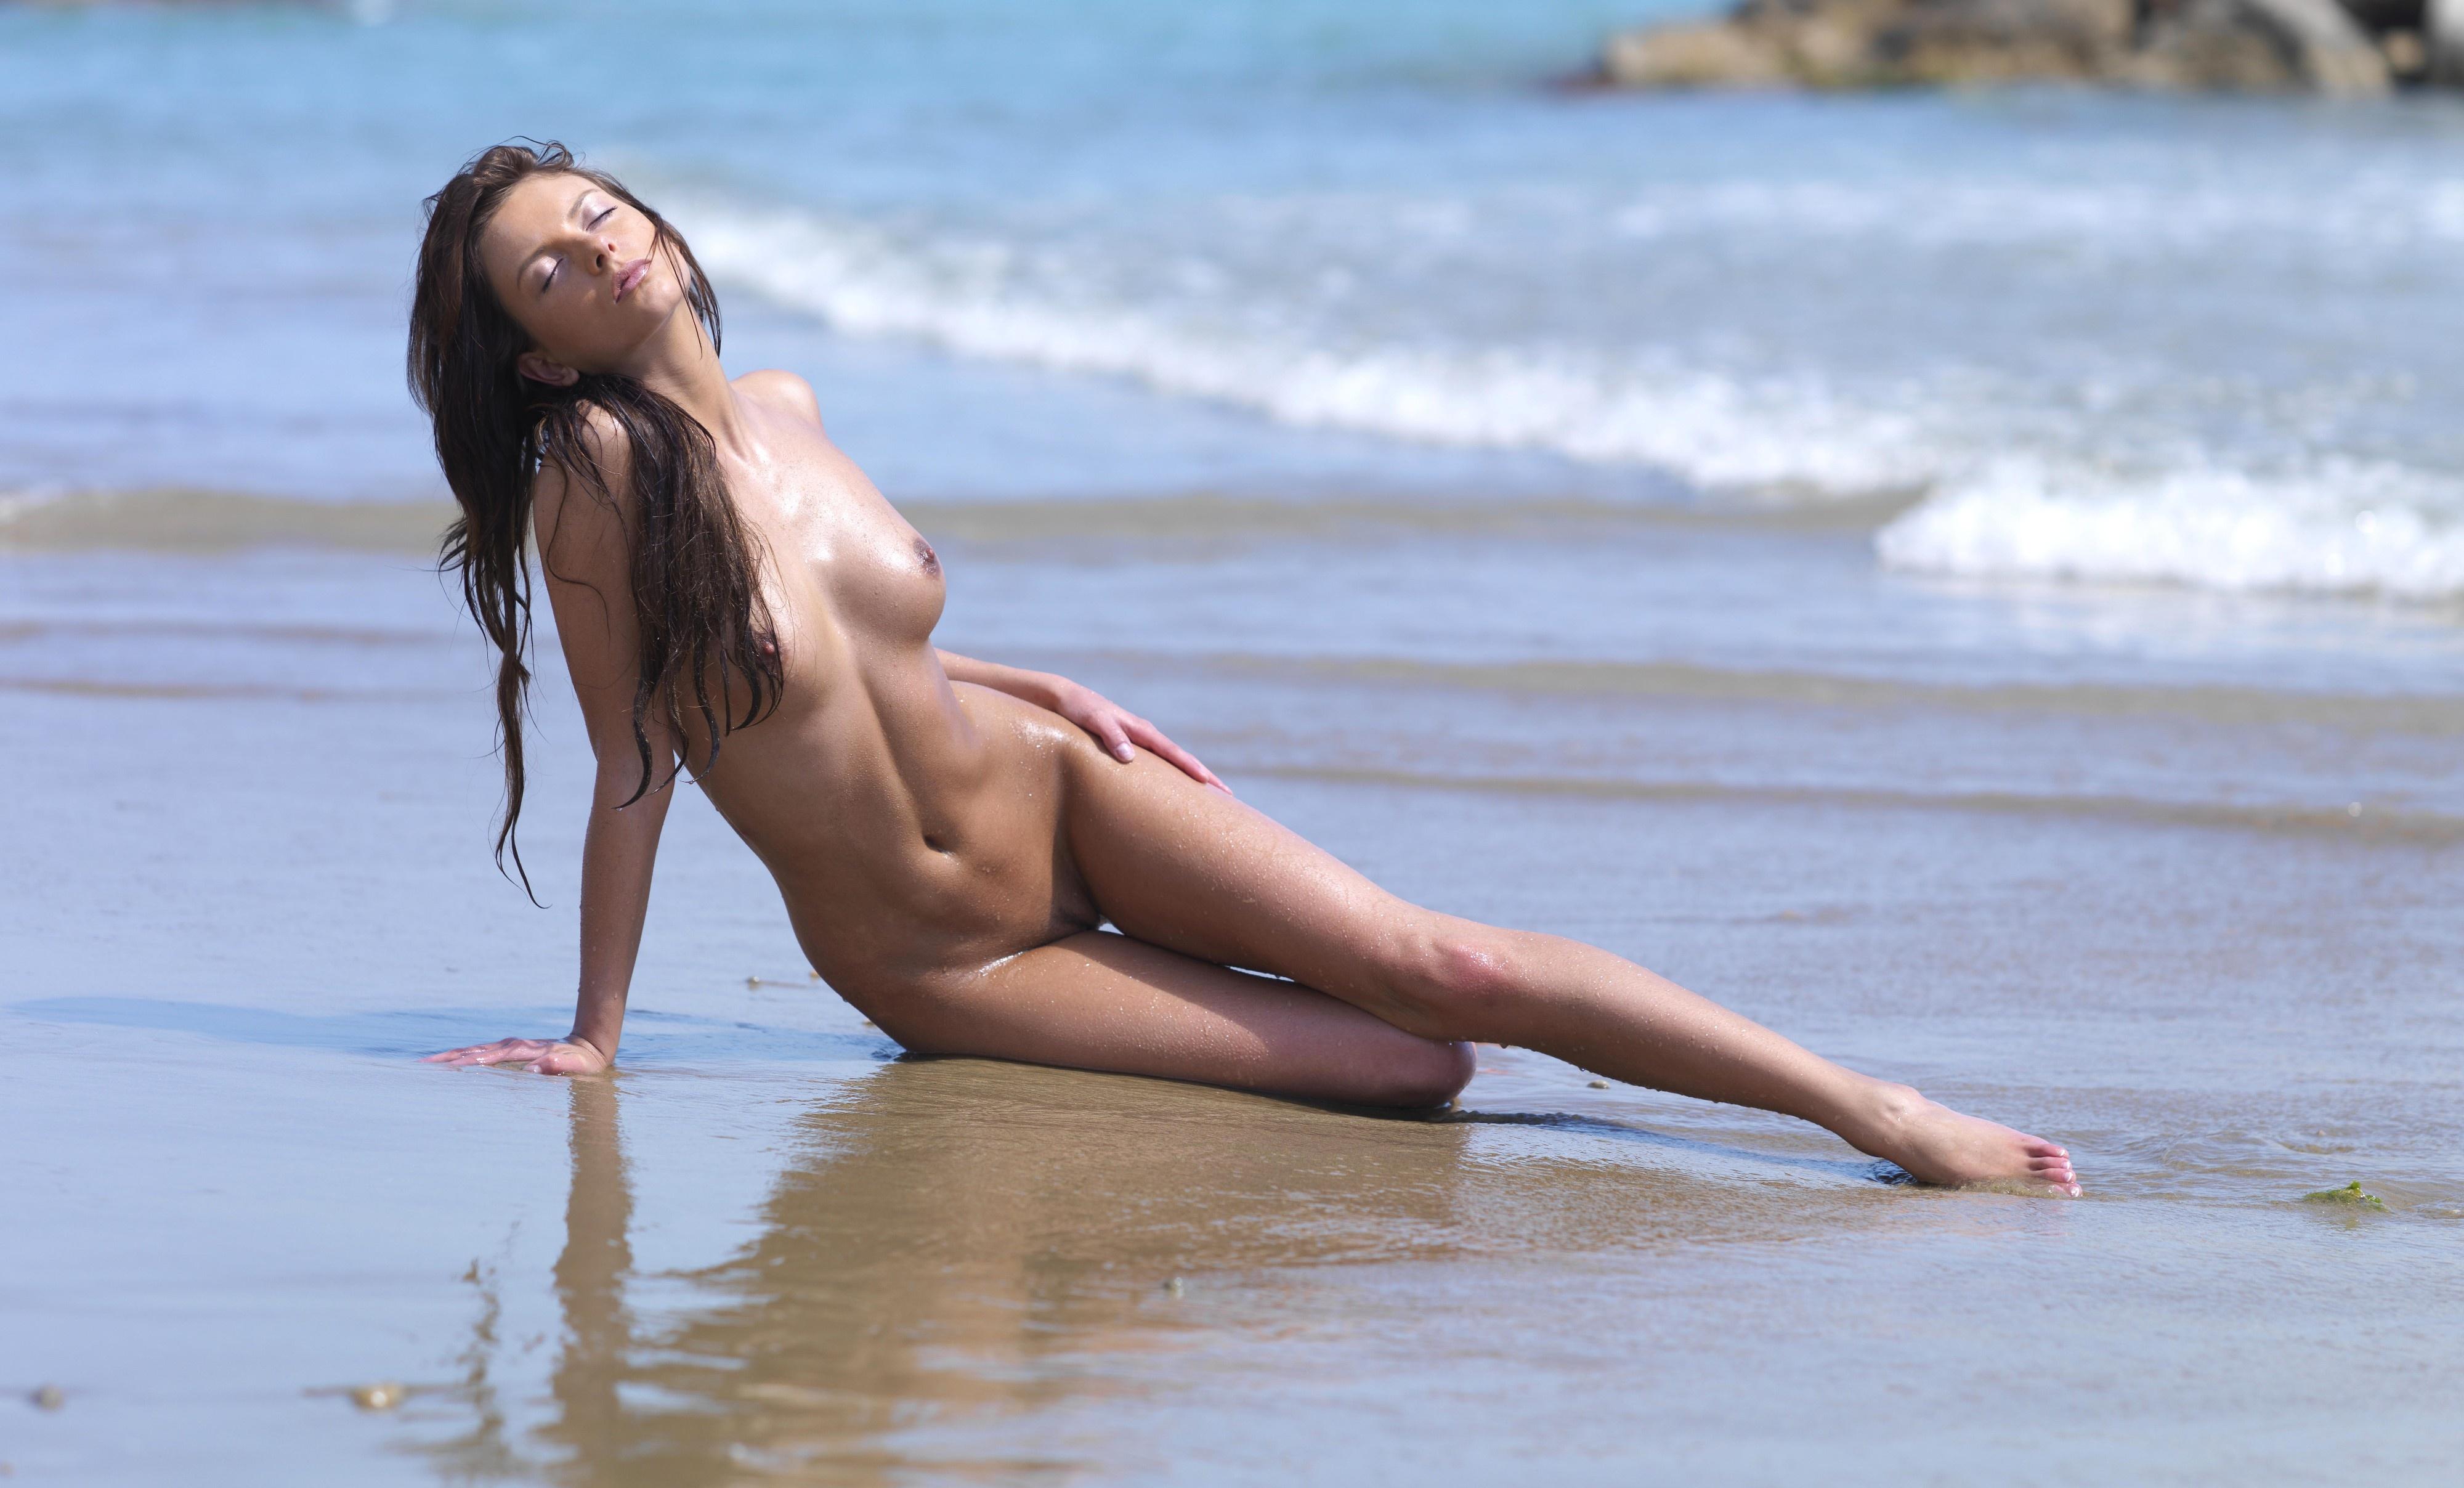 Nude Beach Just Girls